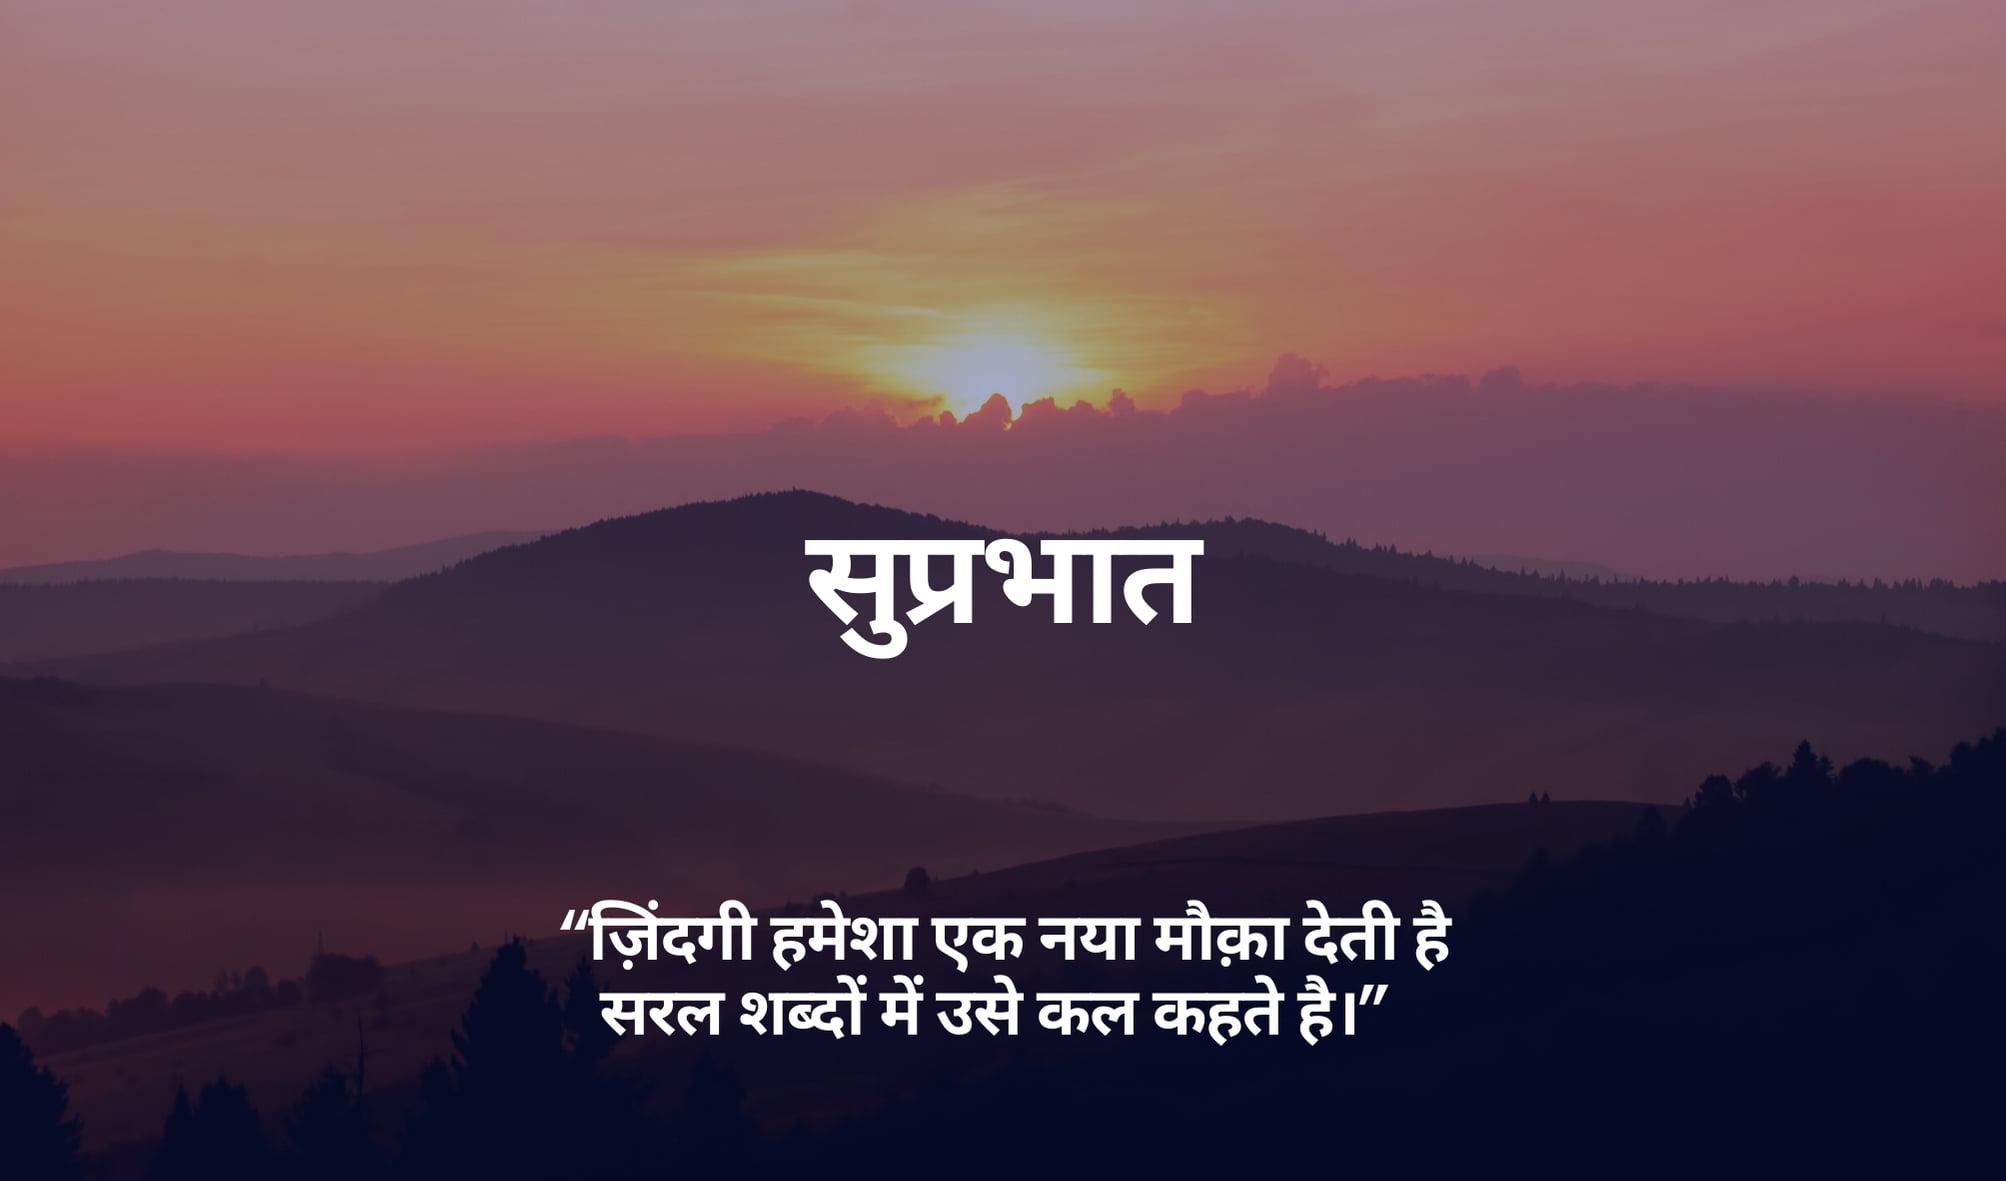 Hindi Good Morning Quote Image full HD free download.